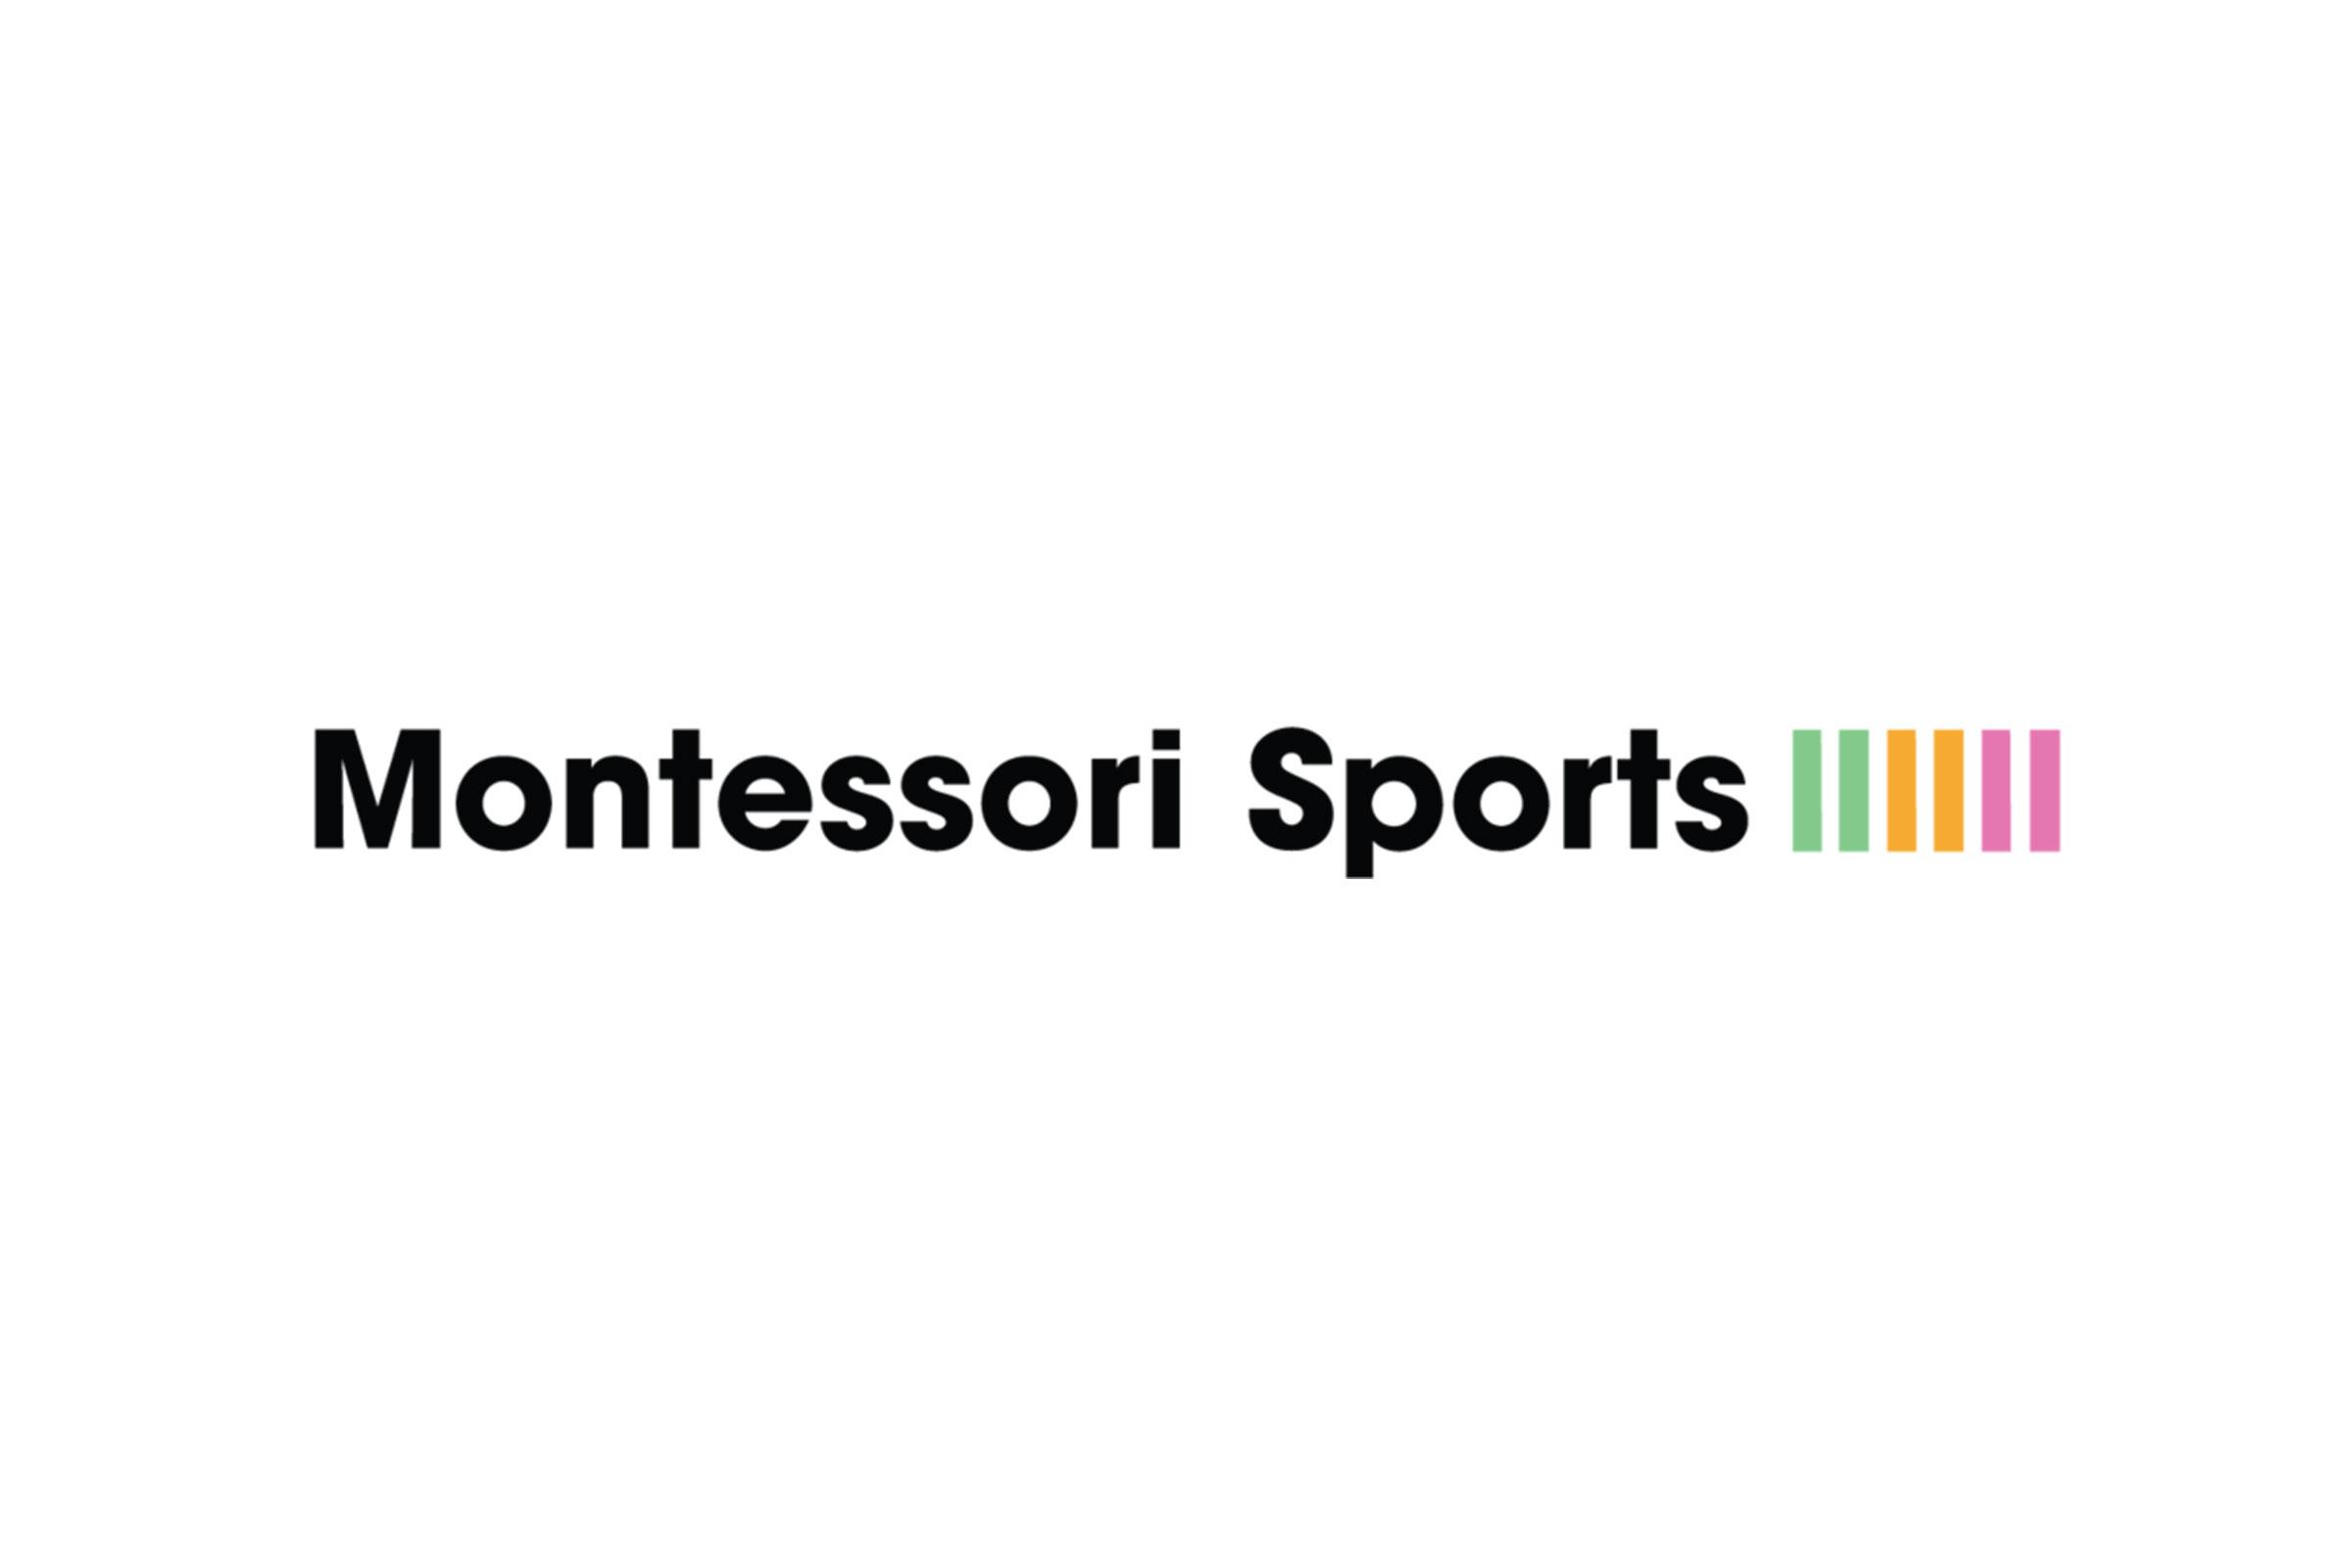 Montessori Sports Logo